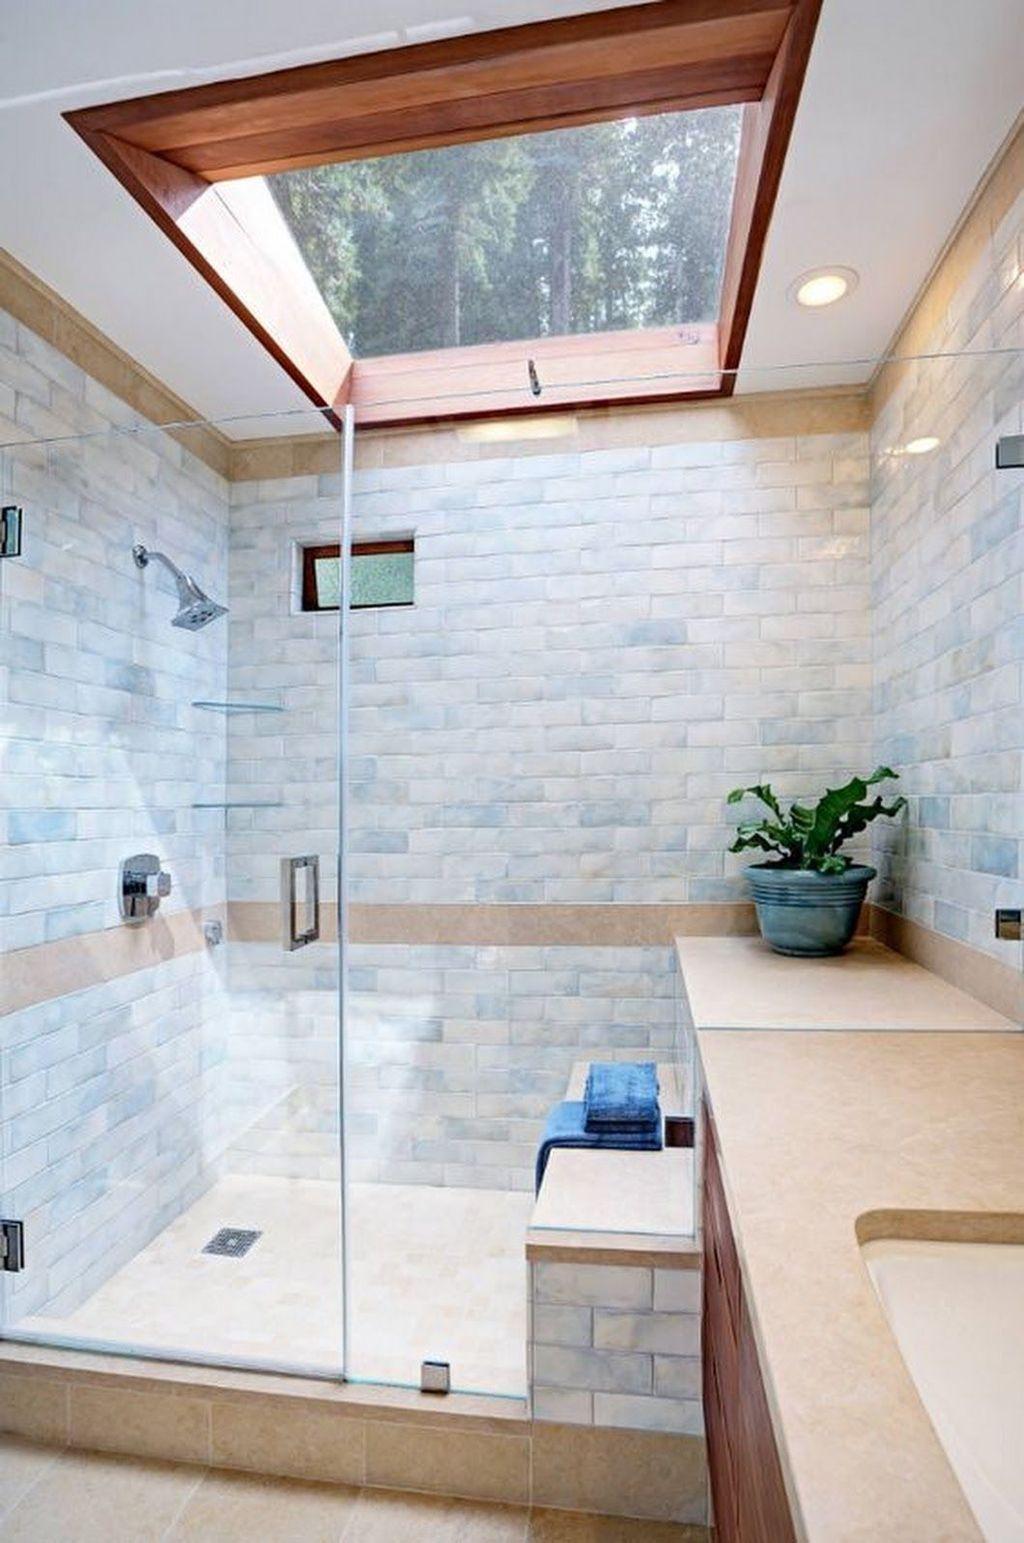 Latest Bathroom Design Ideas To Try Asap 01